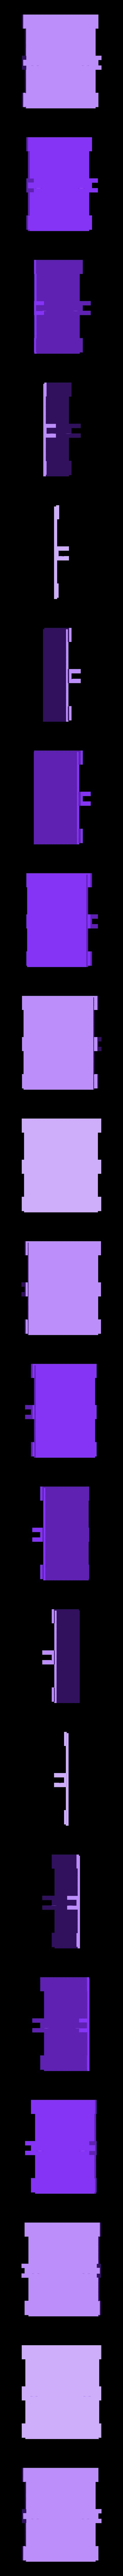 cart_base1.stl Download free STL file Saxon Rustic Cart • 3D printable template, Earsling